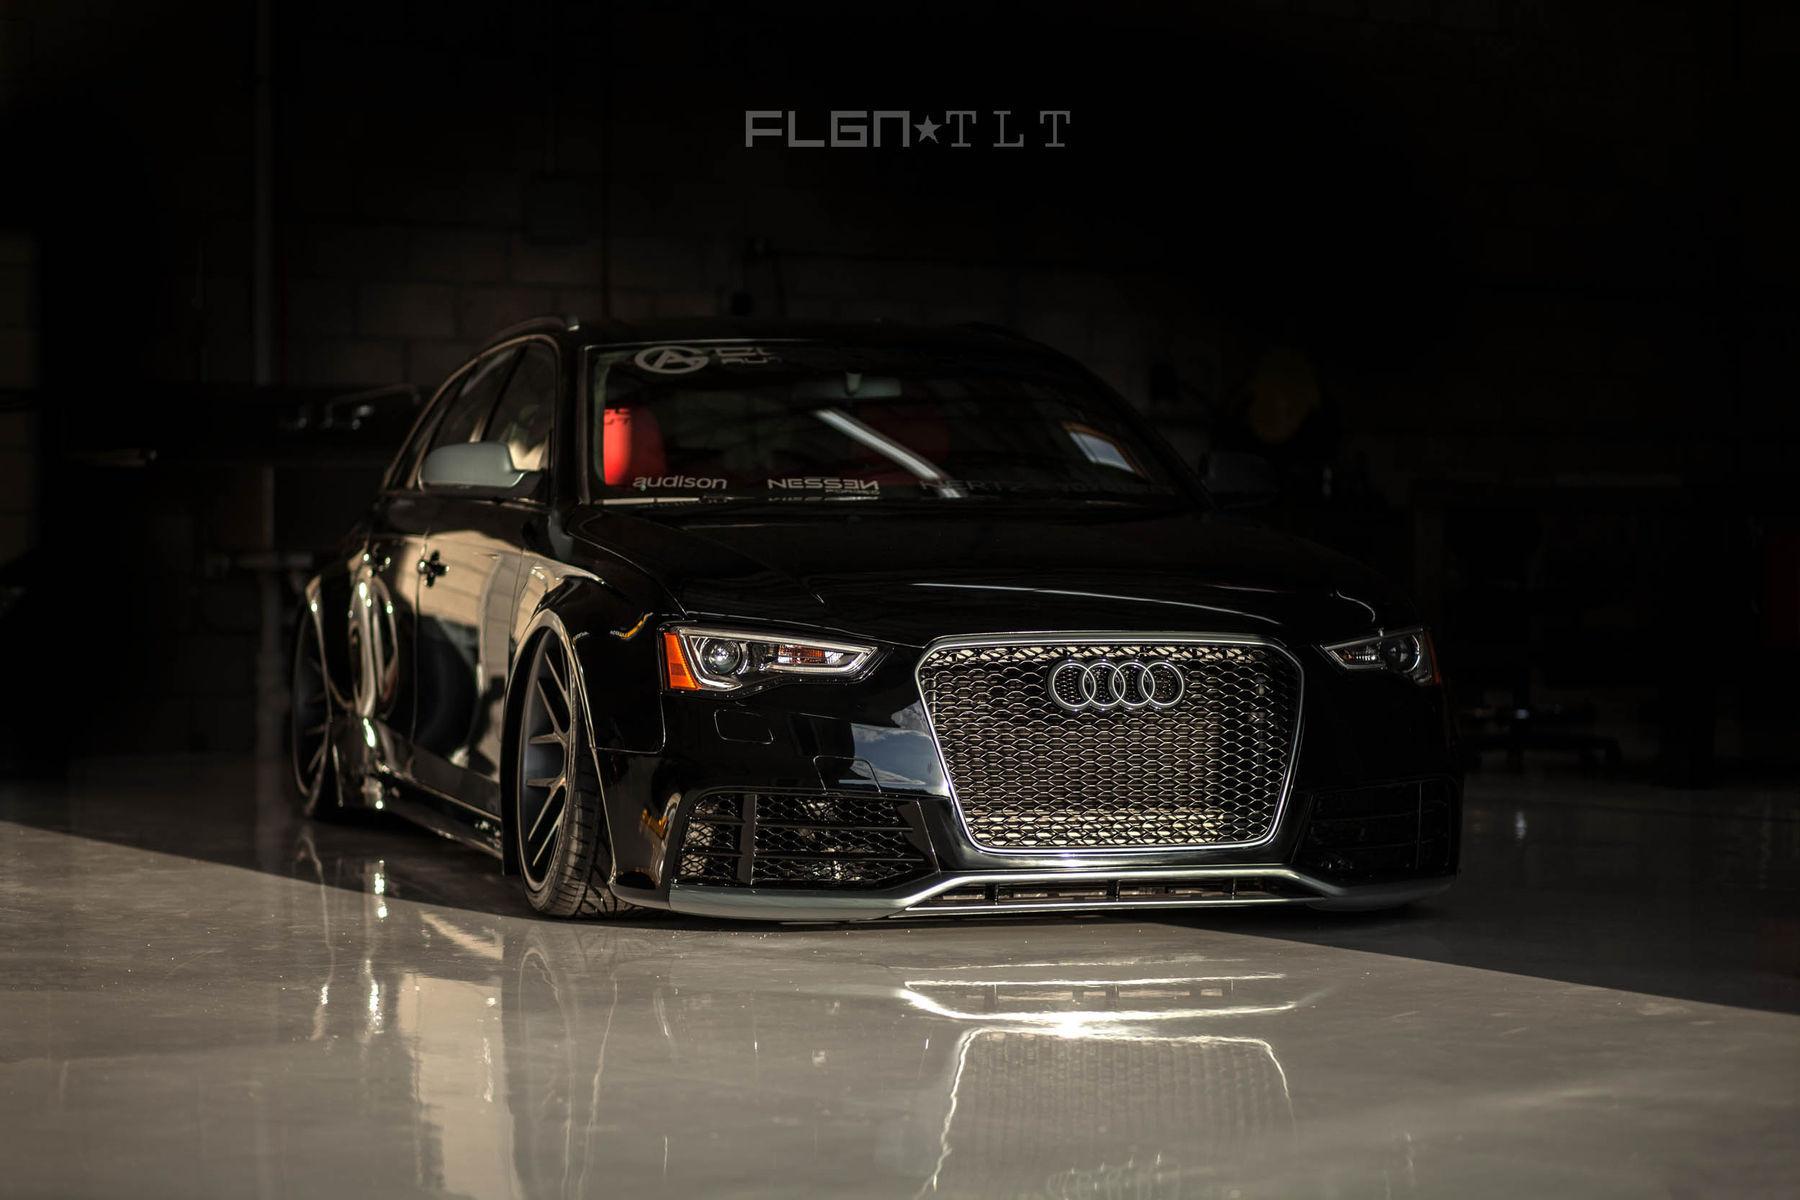 2010 Audi allroad quattro | AllRoad Quattro